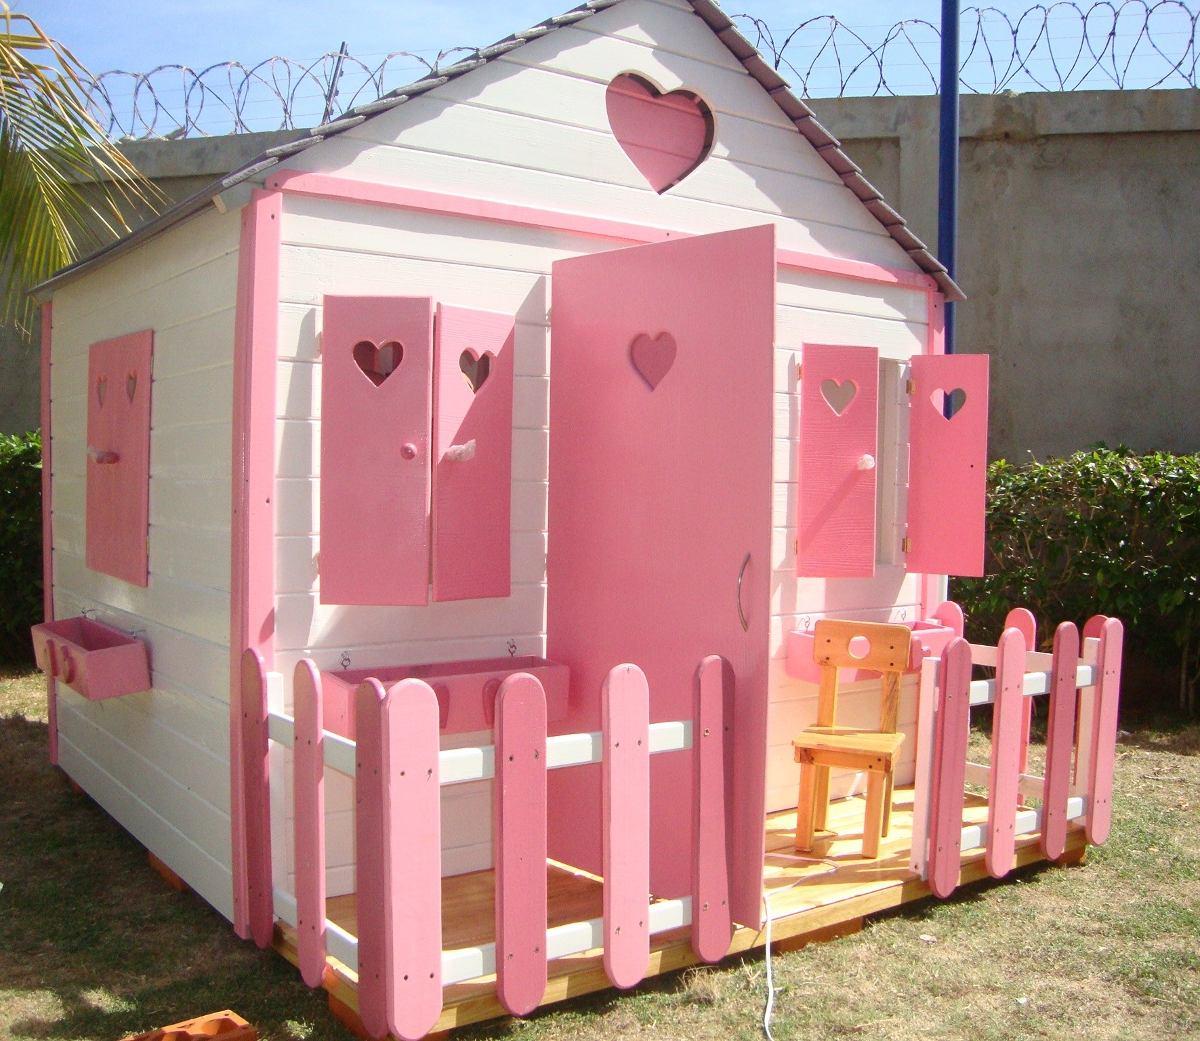 Casa ni as juguete grande madera para jardines bs for Casa juguete jardin